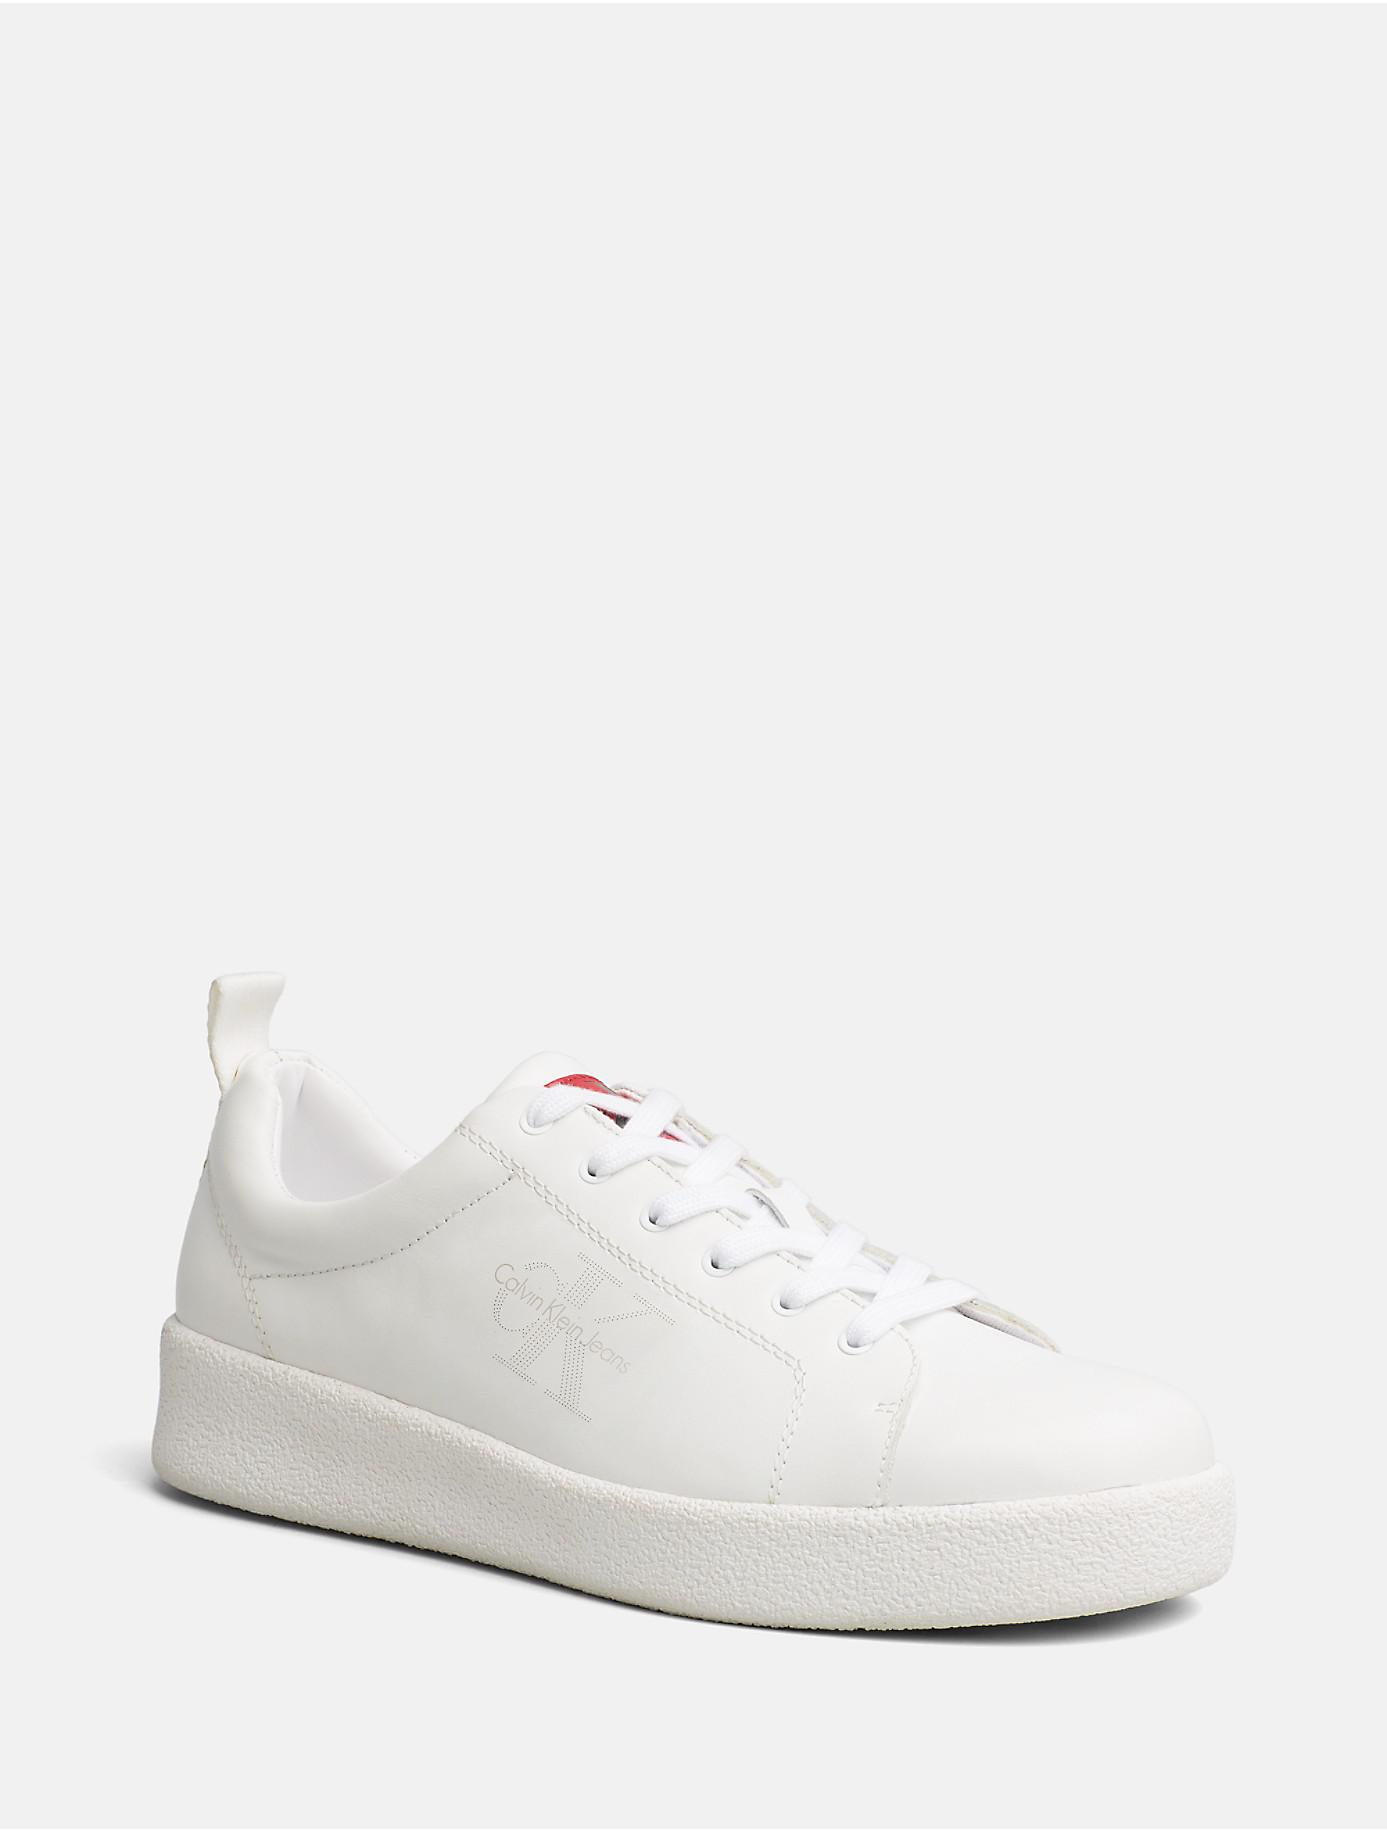 Gerald Calvin Klein Jeans y3IK2UU